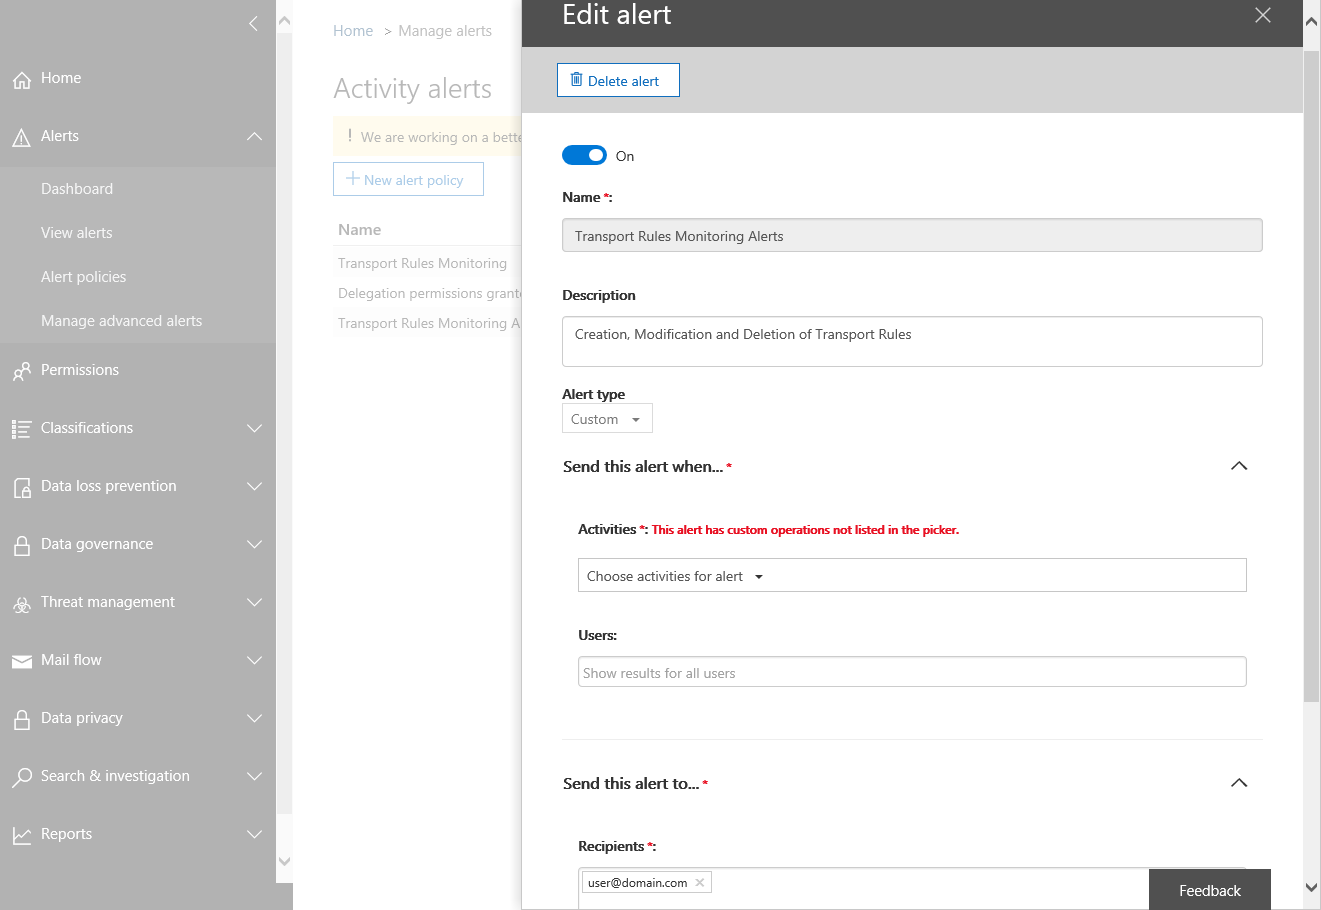 Activity Alerts Screenshot of Edit Alert